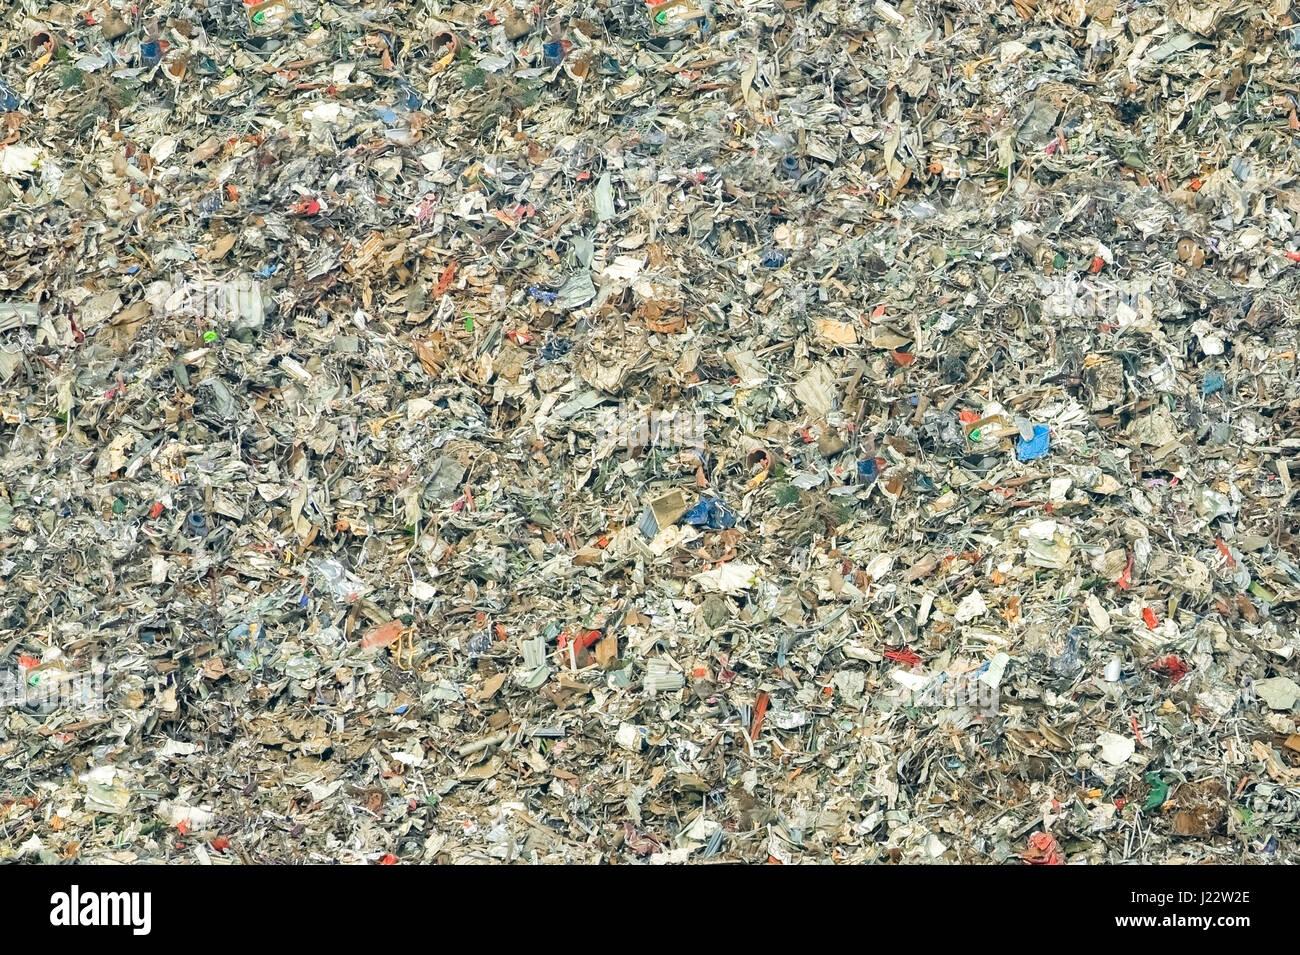 massive pile of decomposing landfill garbage - no visible trademarks - Stock Image